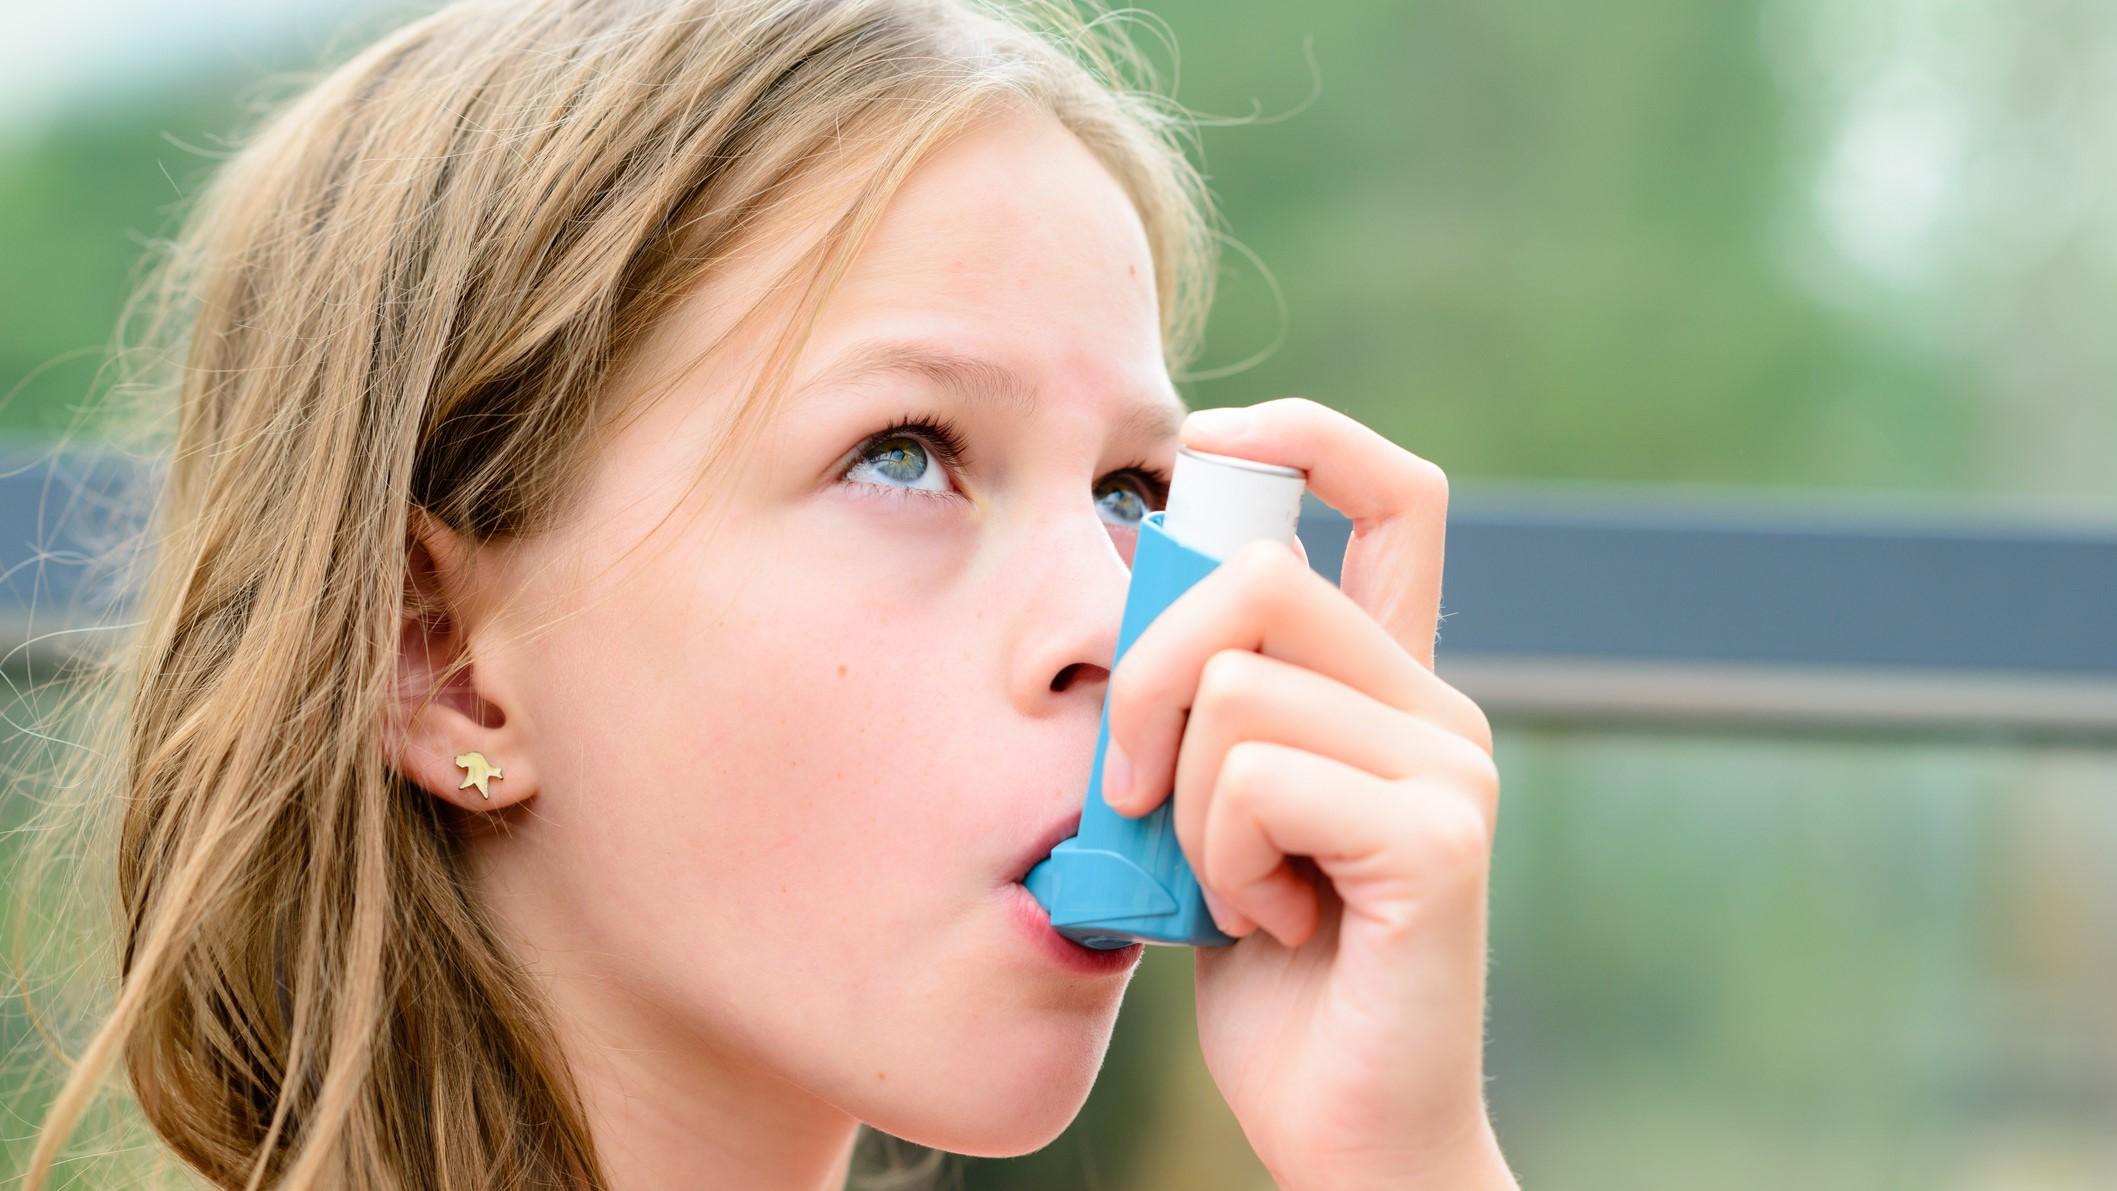 Pretty girl using asthma inhaler